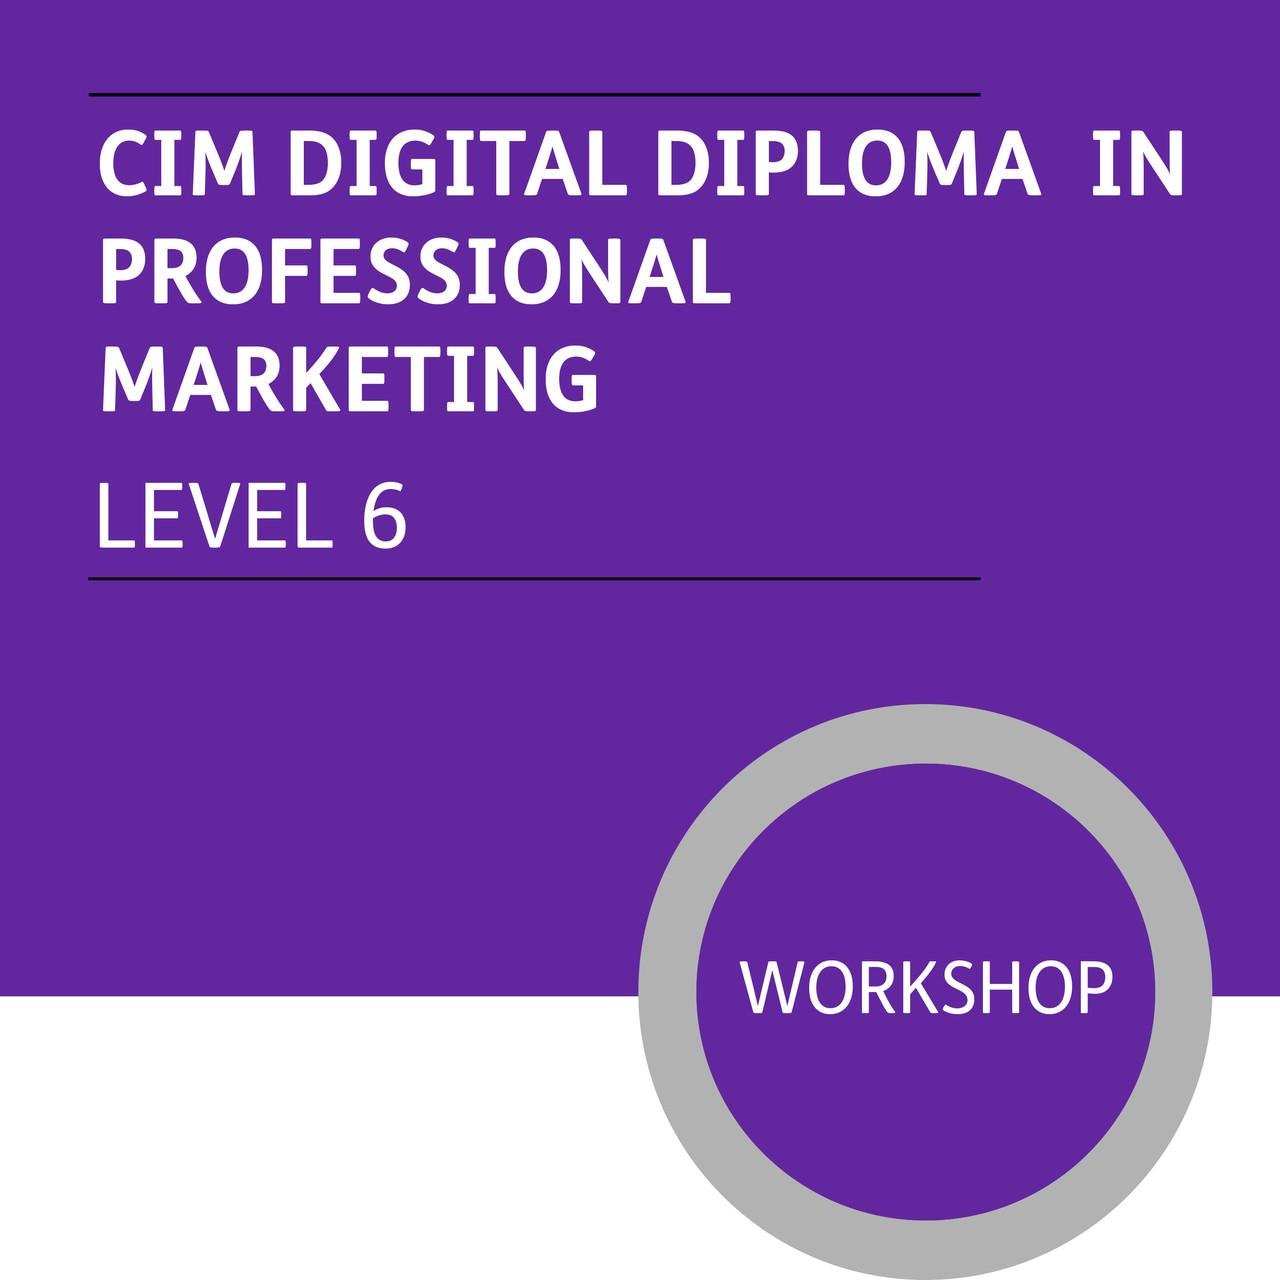 cim digital diploma in professional marketing level premium  cim digital diploma in professional marketing level 6 premium workshops